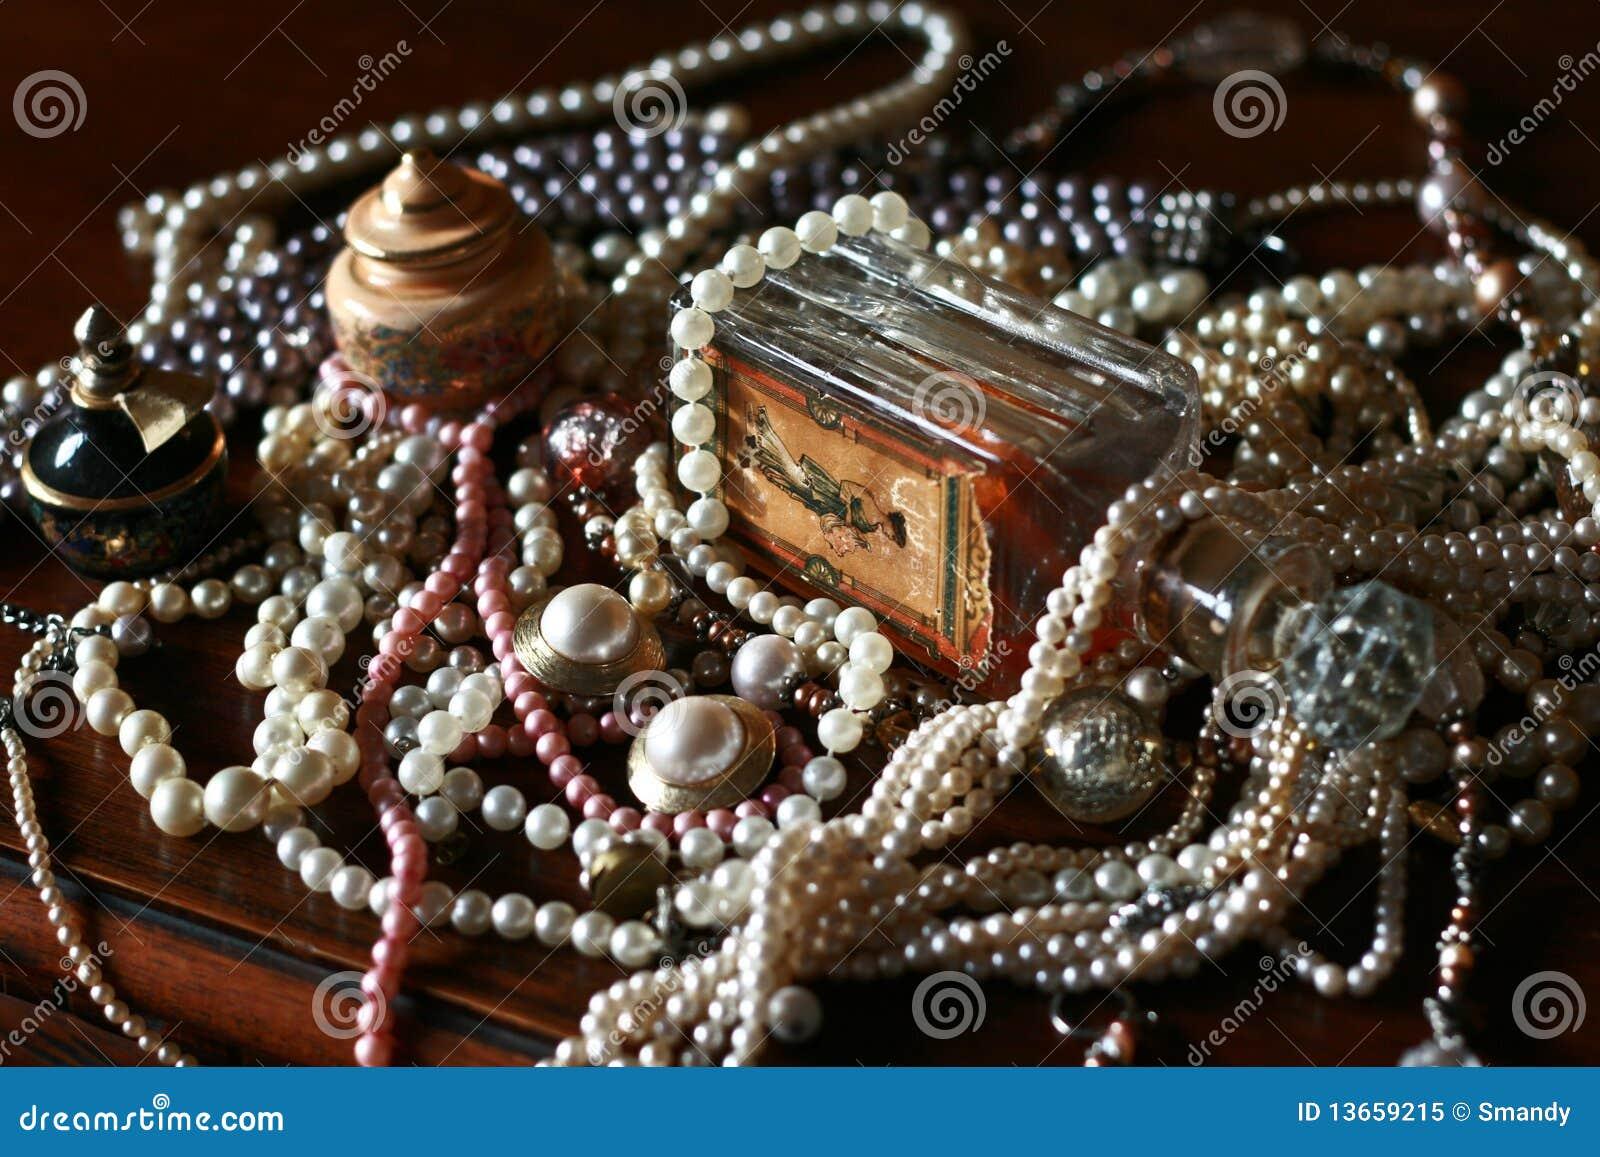 Uitstekende parelsschat, oude parfumfles